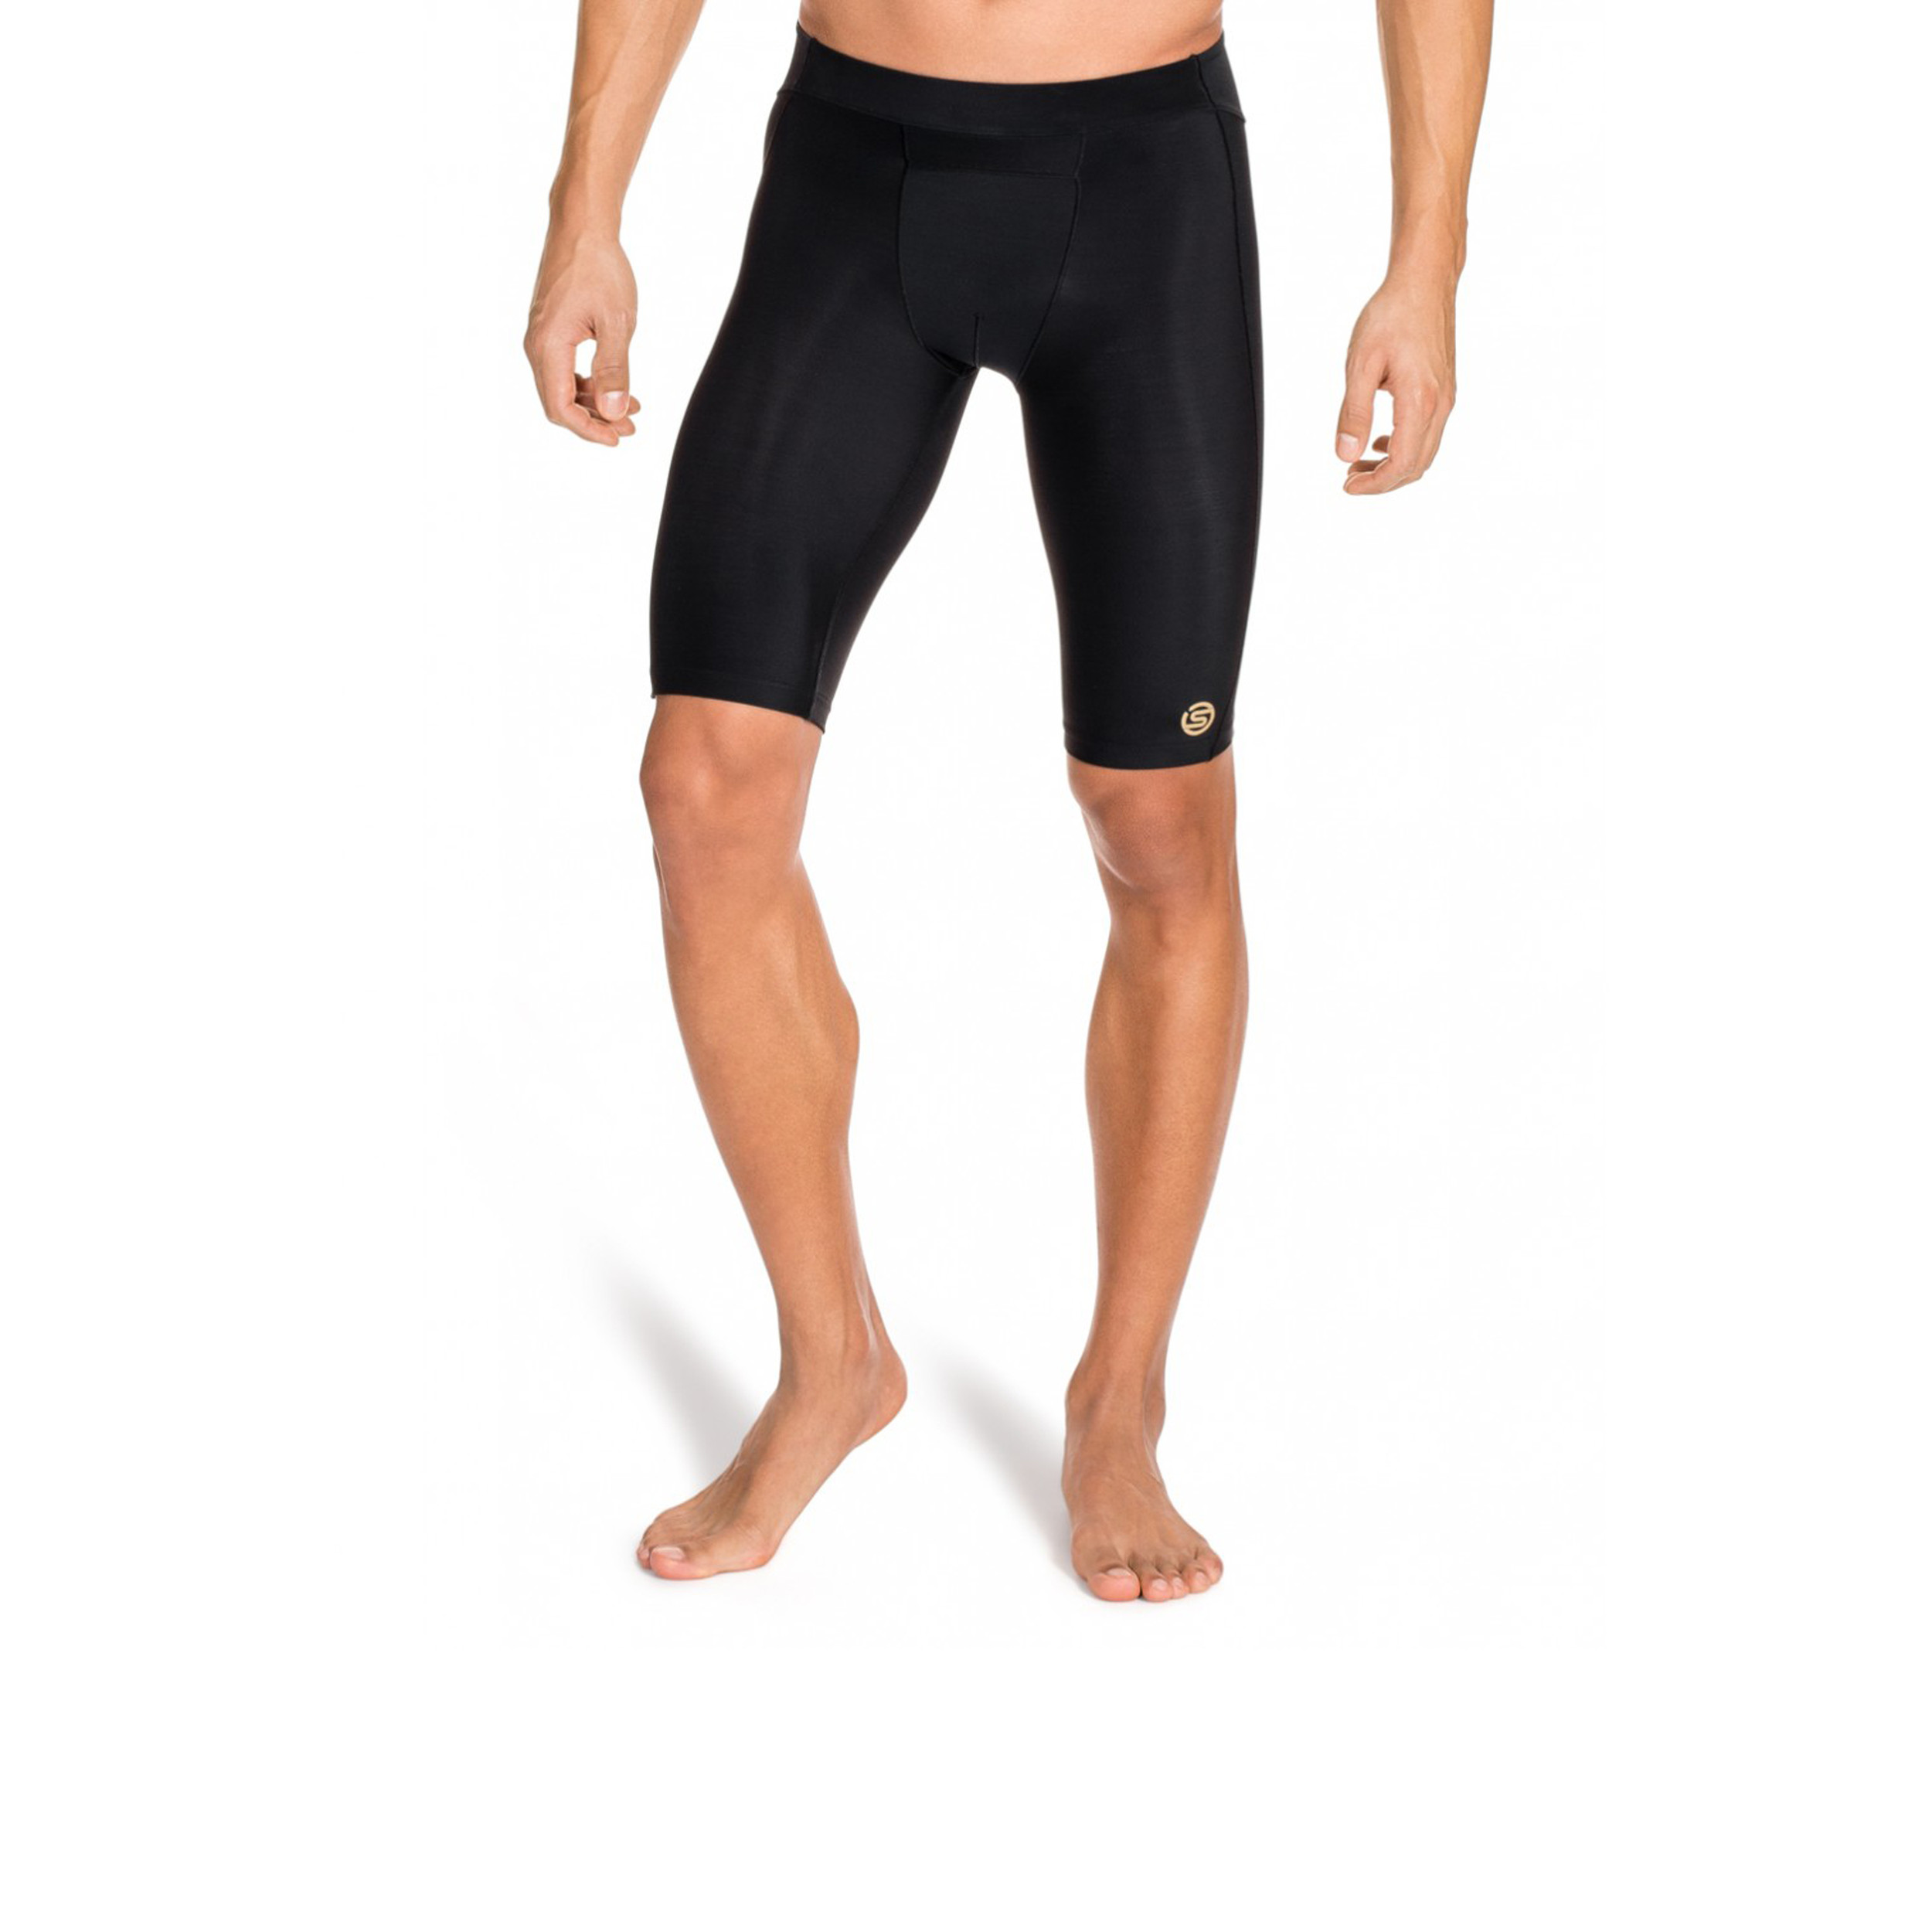 Skins Homme Bio A400 Compression Tight Shorts Pantalon Pantalon noir sport